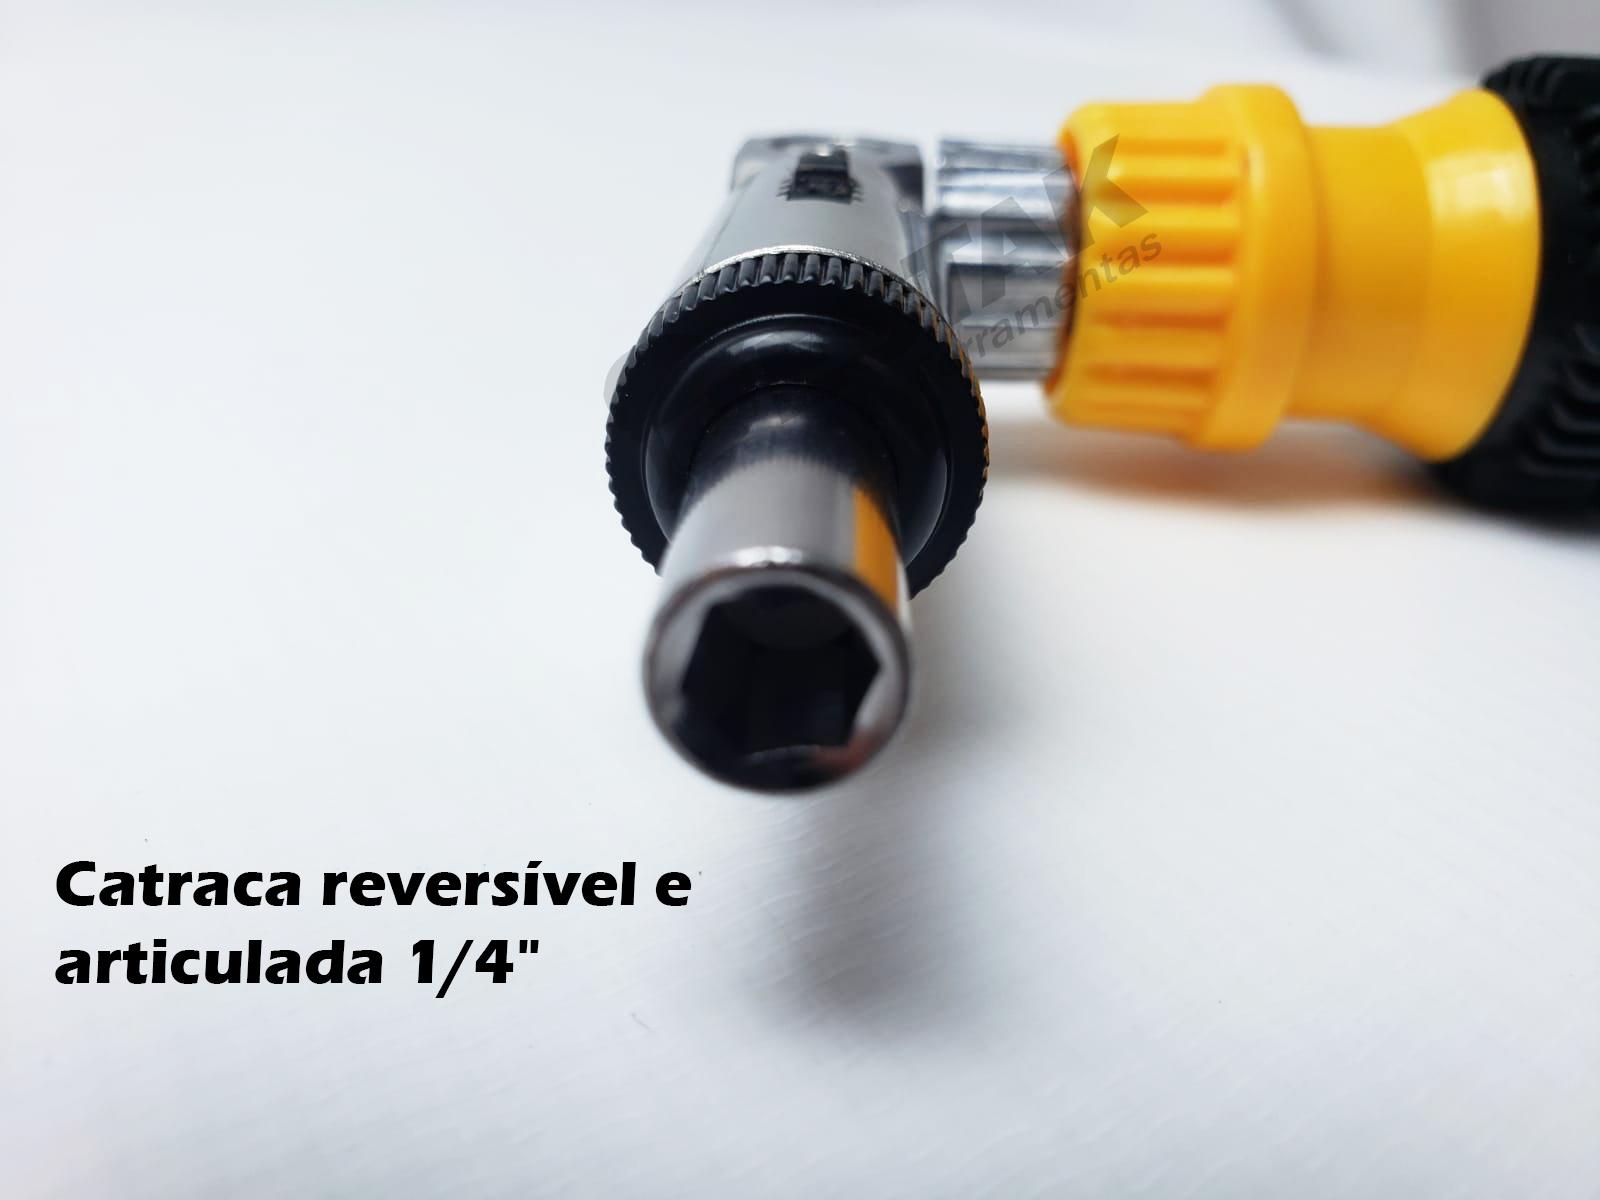 Kit 46 Ferramentas Estepe Macaco 2 Toneladas